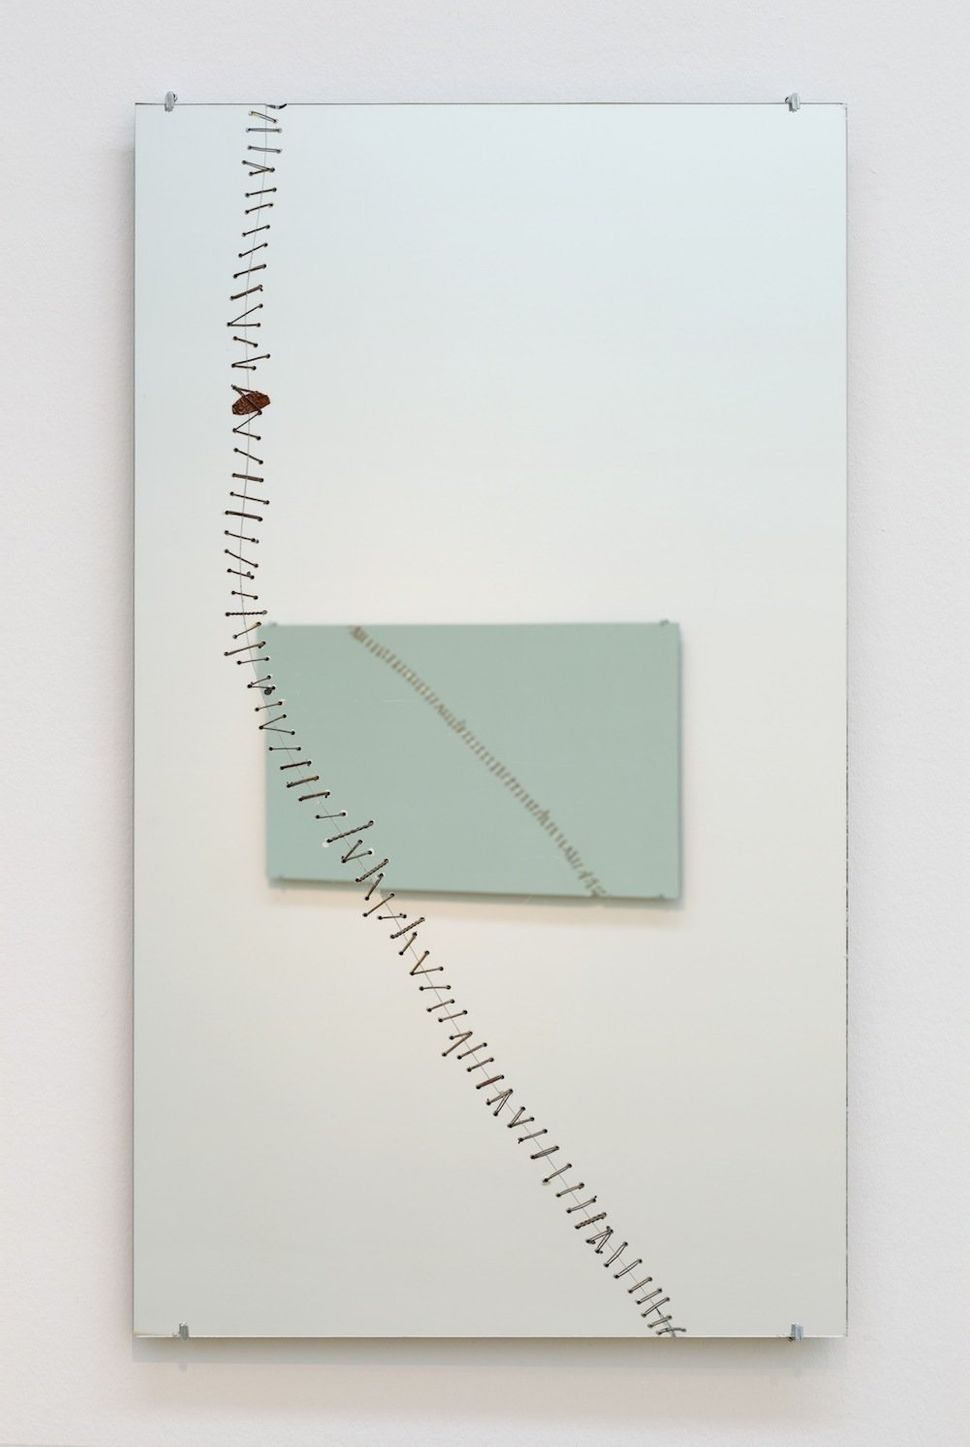 Kadar Attia, Repair Analysis, 2013. Courtesy of the artist and Galerie Krinzinger, Vienna.